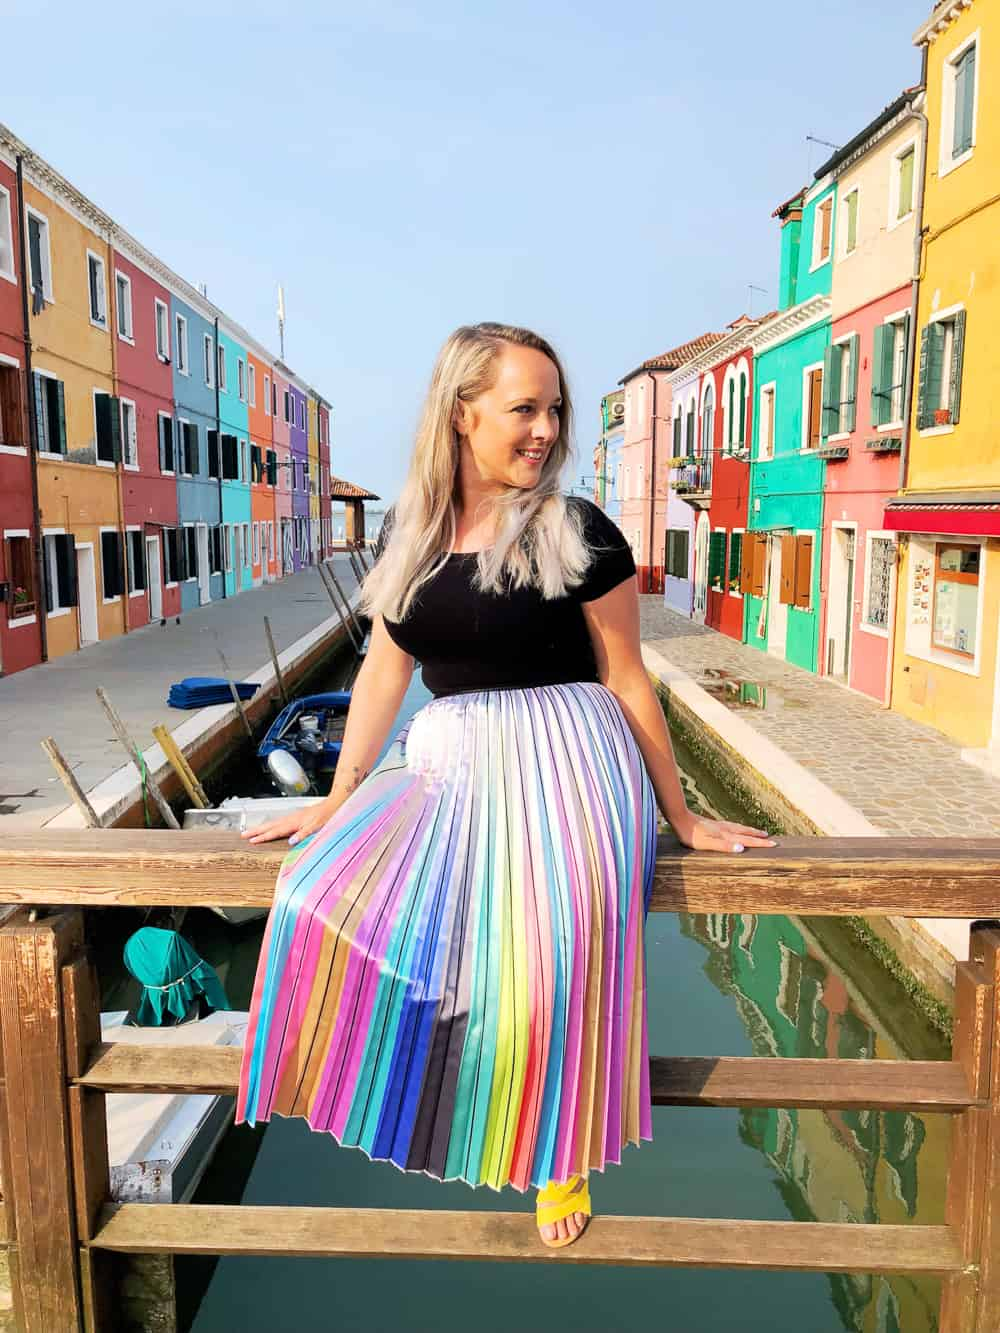 Emily S Classy Italian Hen Party In Burano Venice Bespoke Bride Wedding Blog